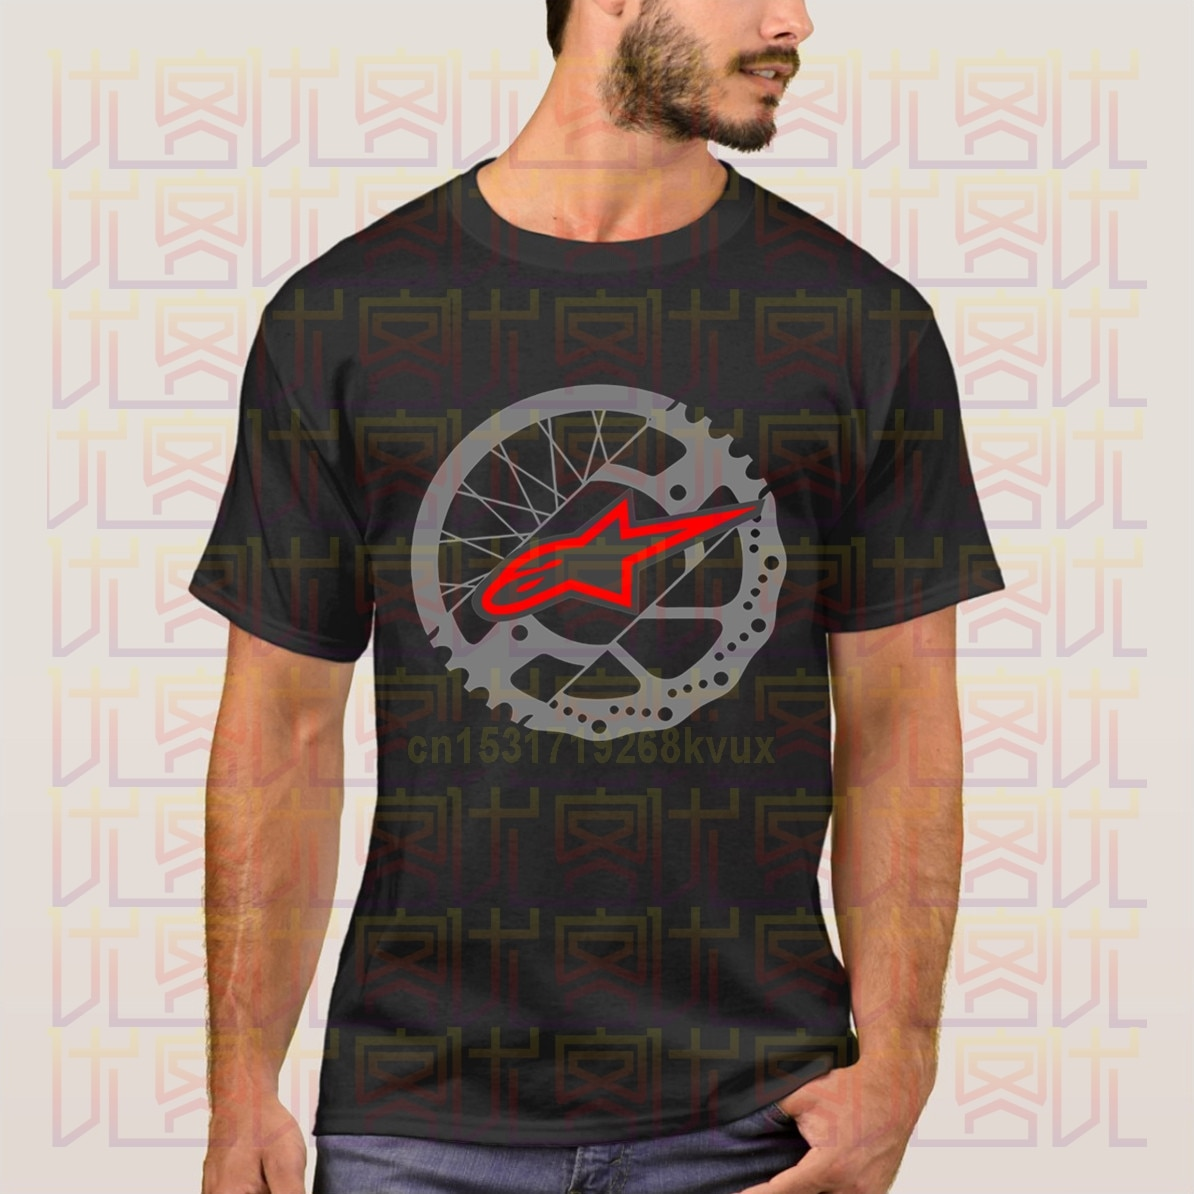 Alpine Star Rotor T-Shirt Tops Summer Tees Cotton O Neck T-Shirt  Amazing Short Sleeve Unique